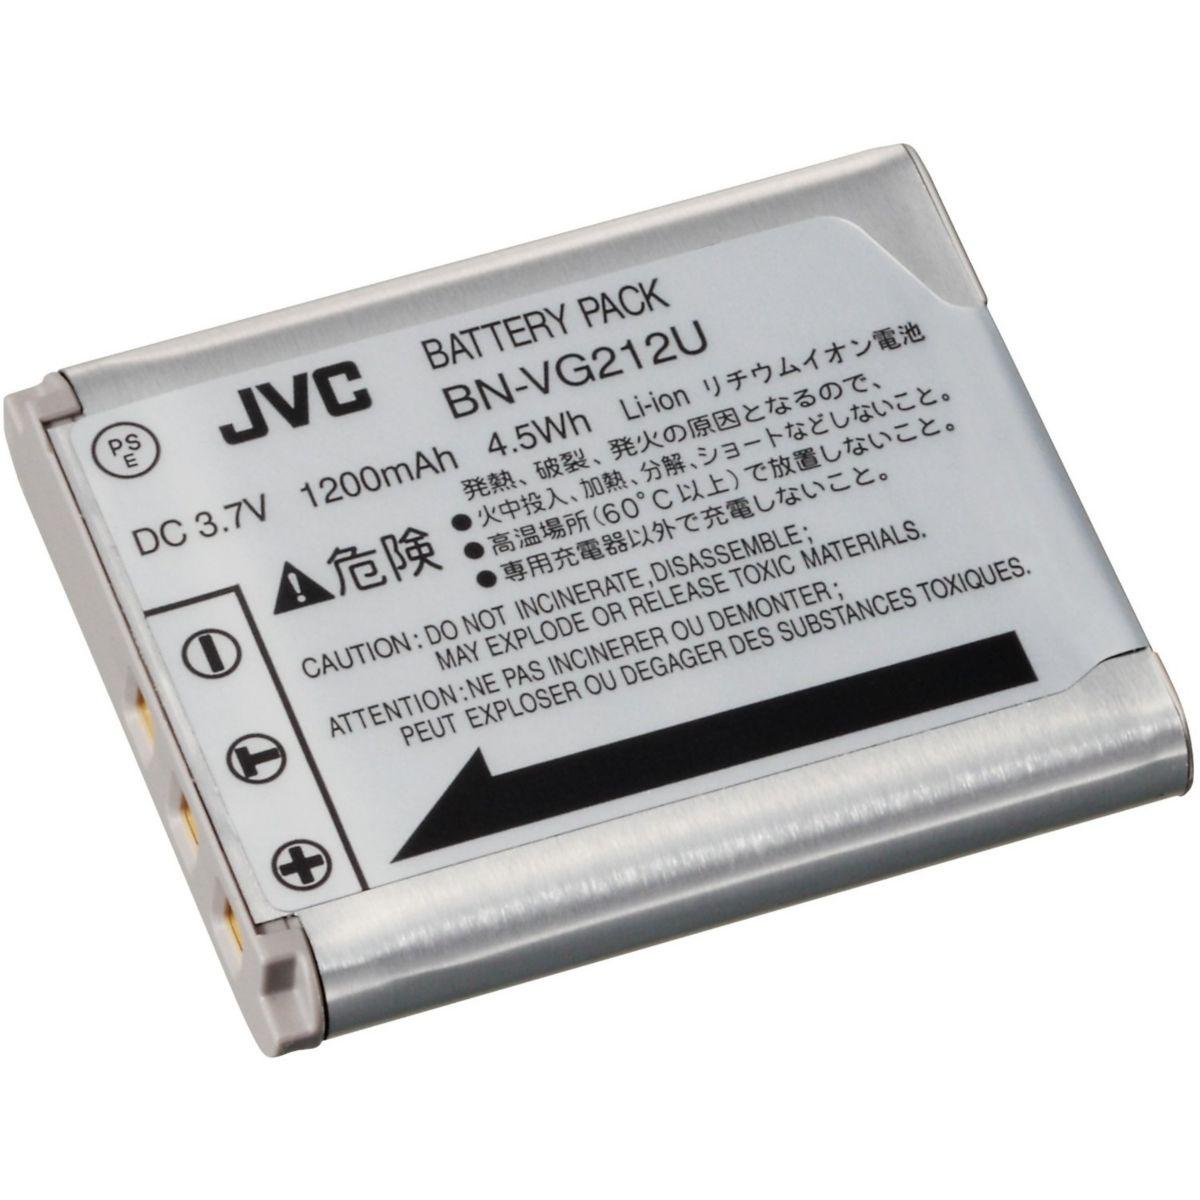 Batterie camescope JVC BN-VG212EU (photo)